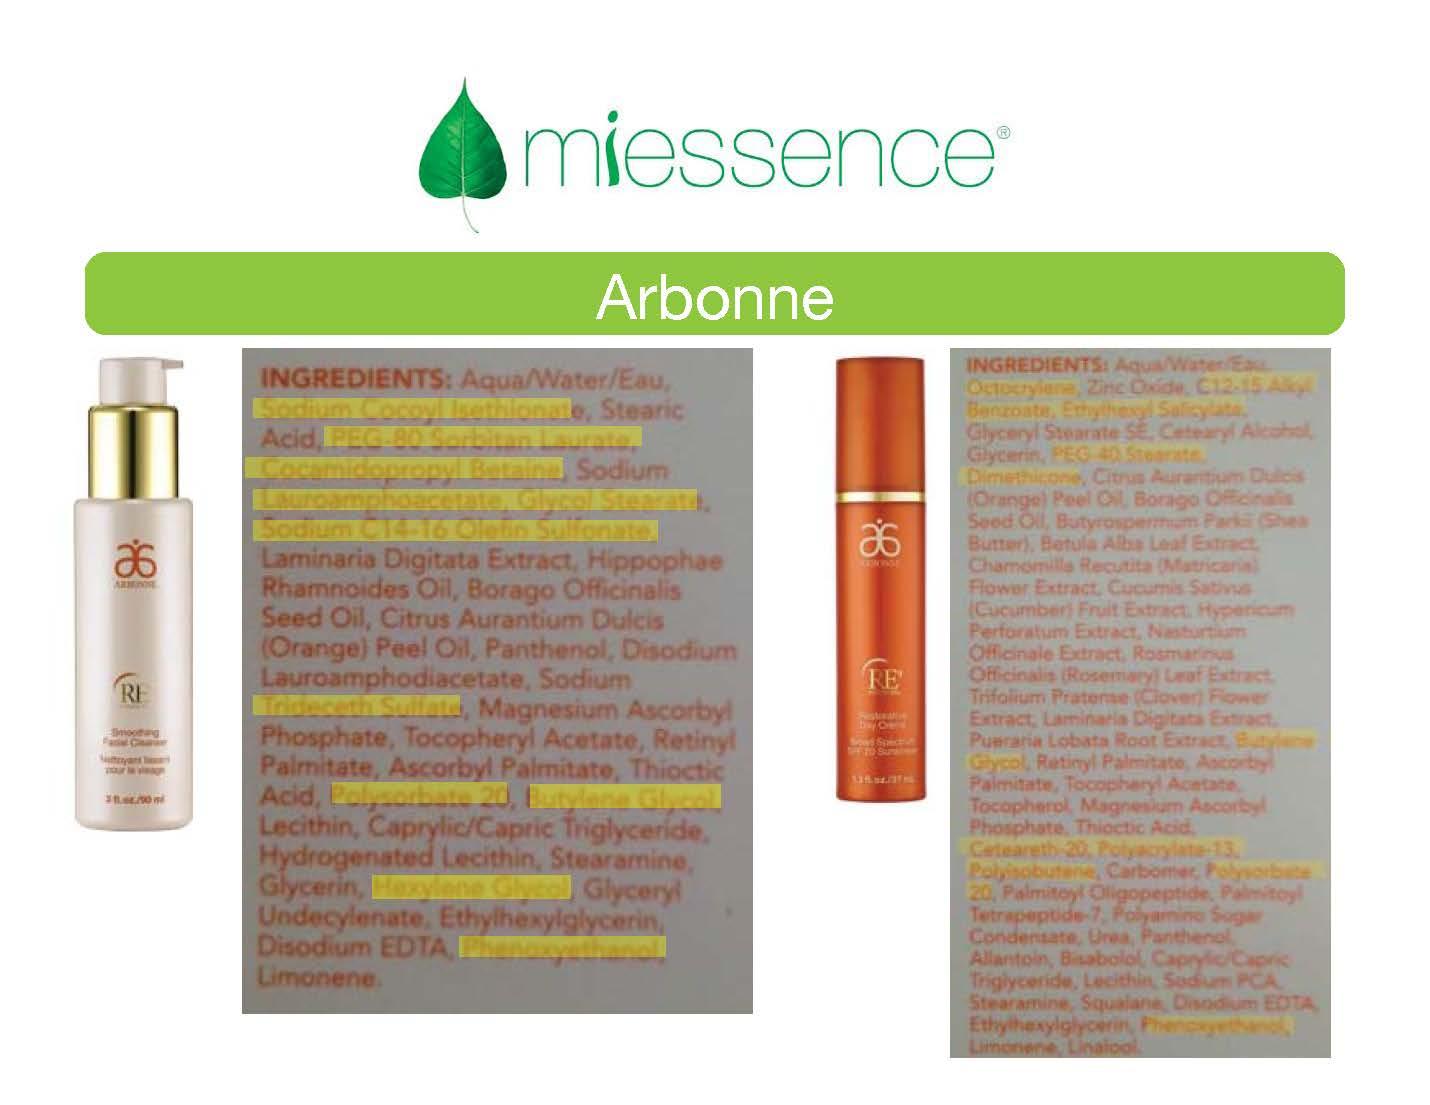 Is Arbonne Organic